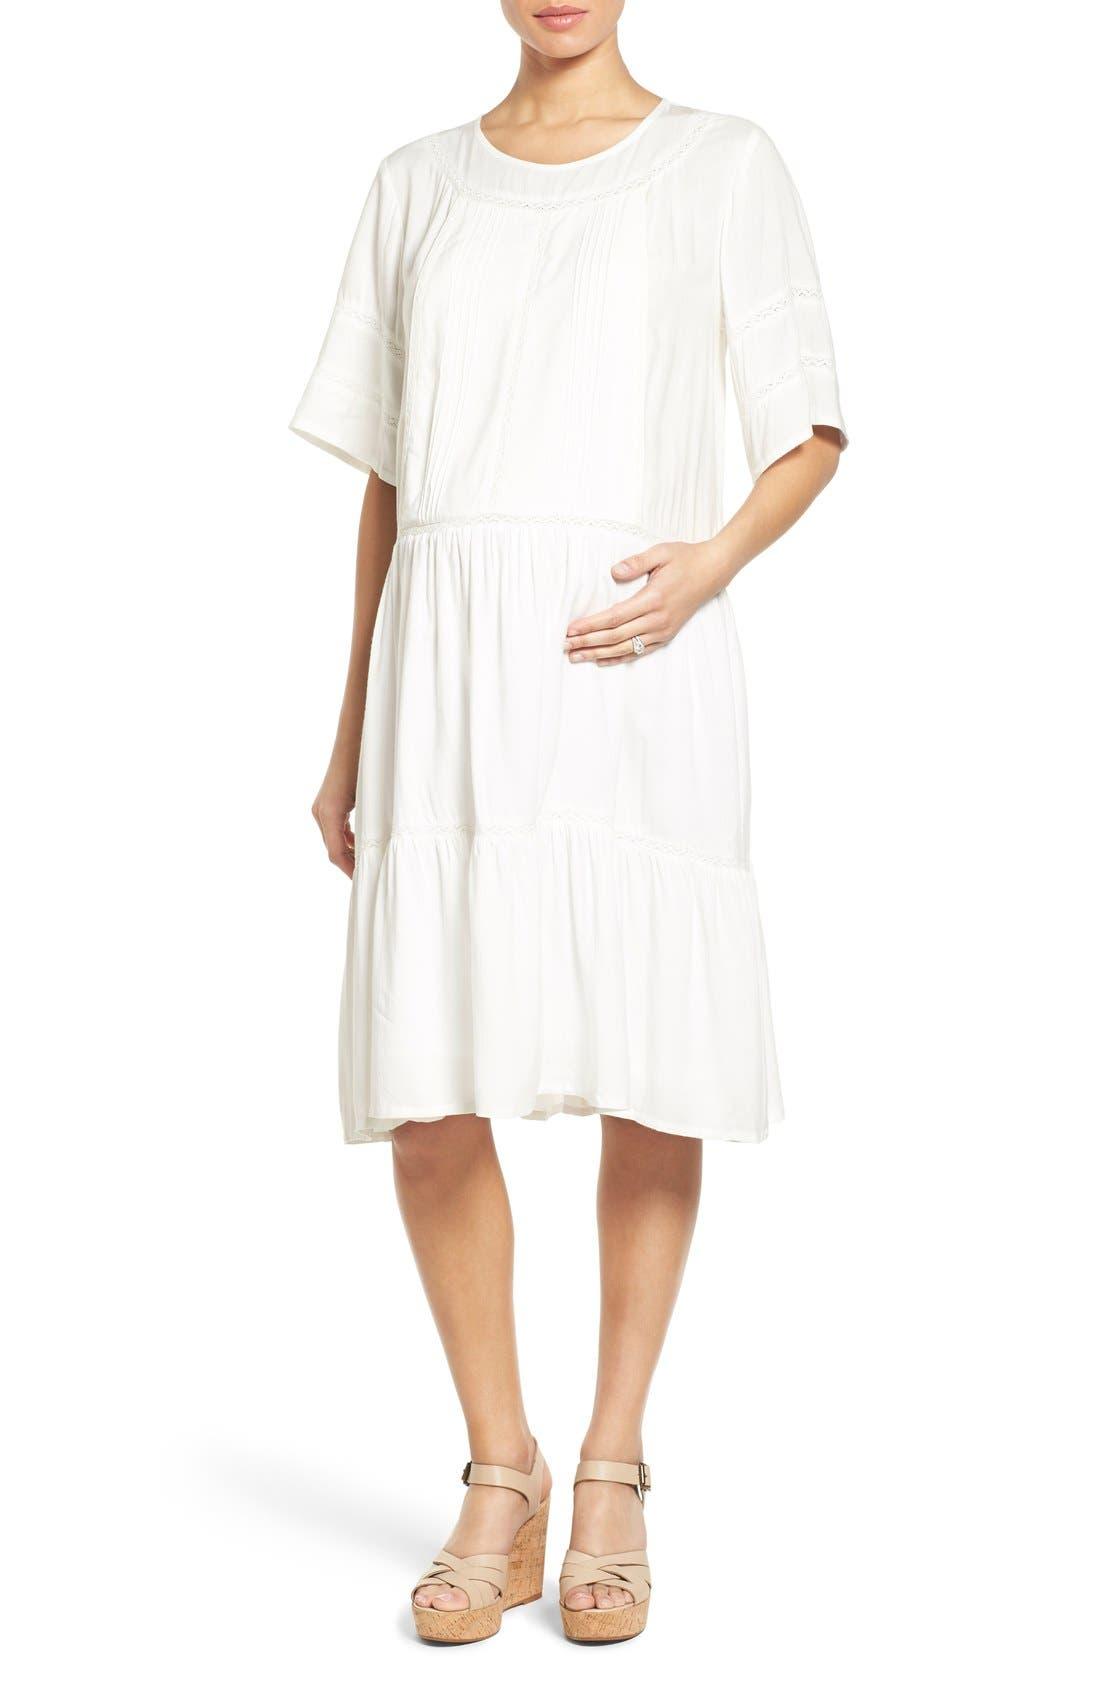 Main Image - Fillyboo 'Wild at Heart' Maternity/Nursing Midi Dress